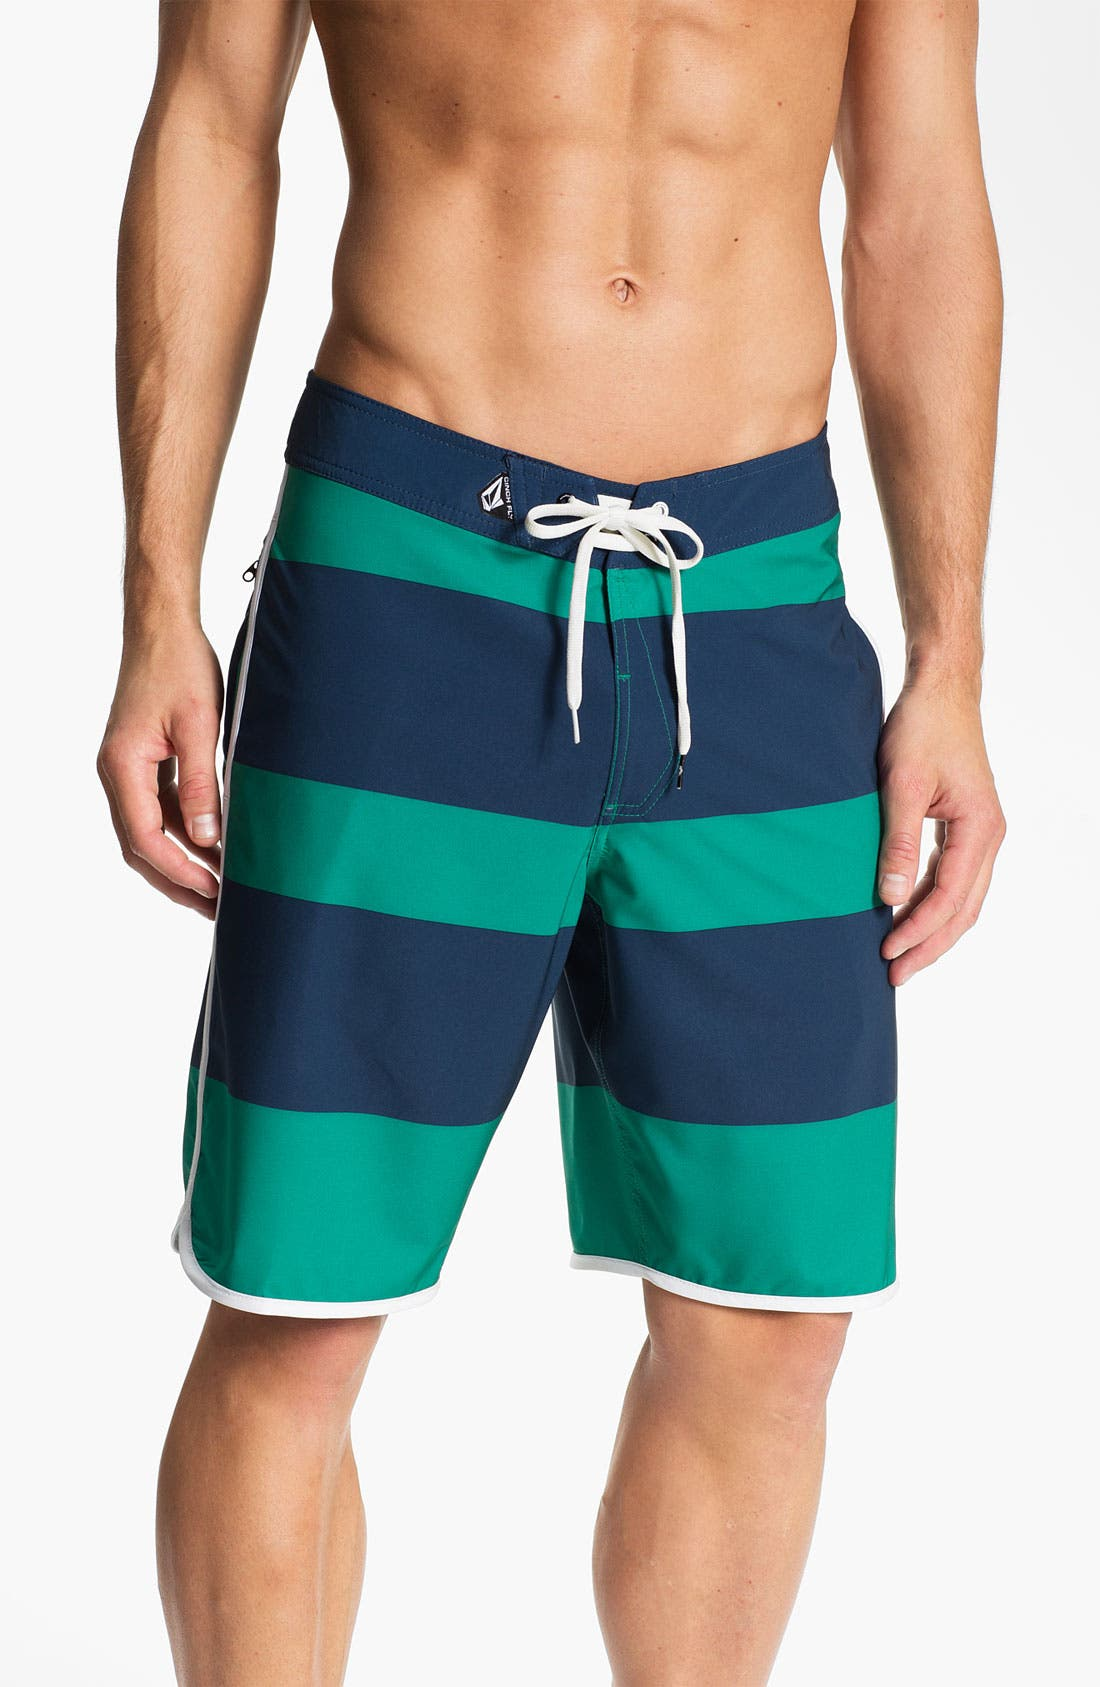 Main Image - Volcom 'Scallop' Board Shorts